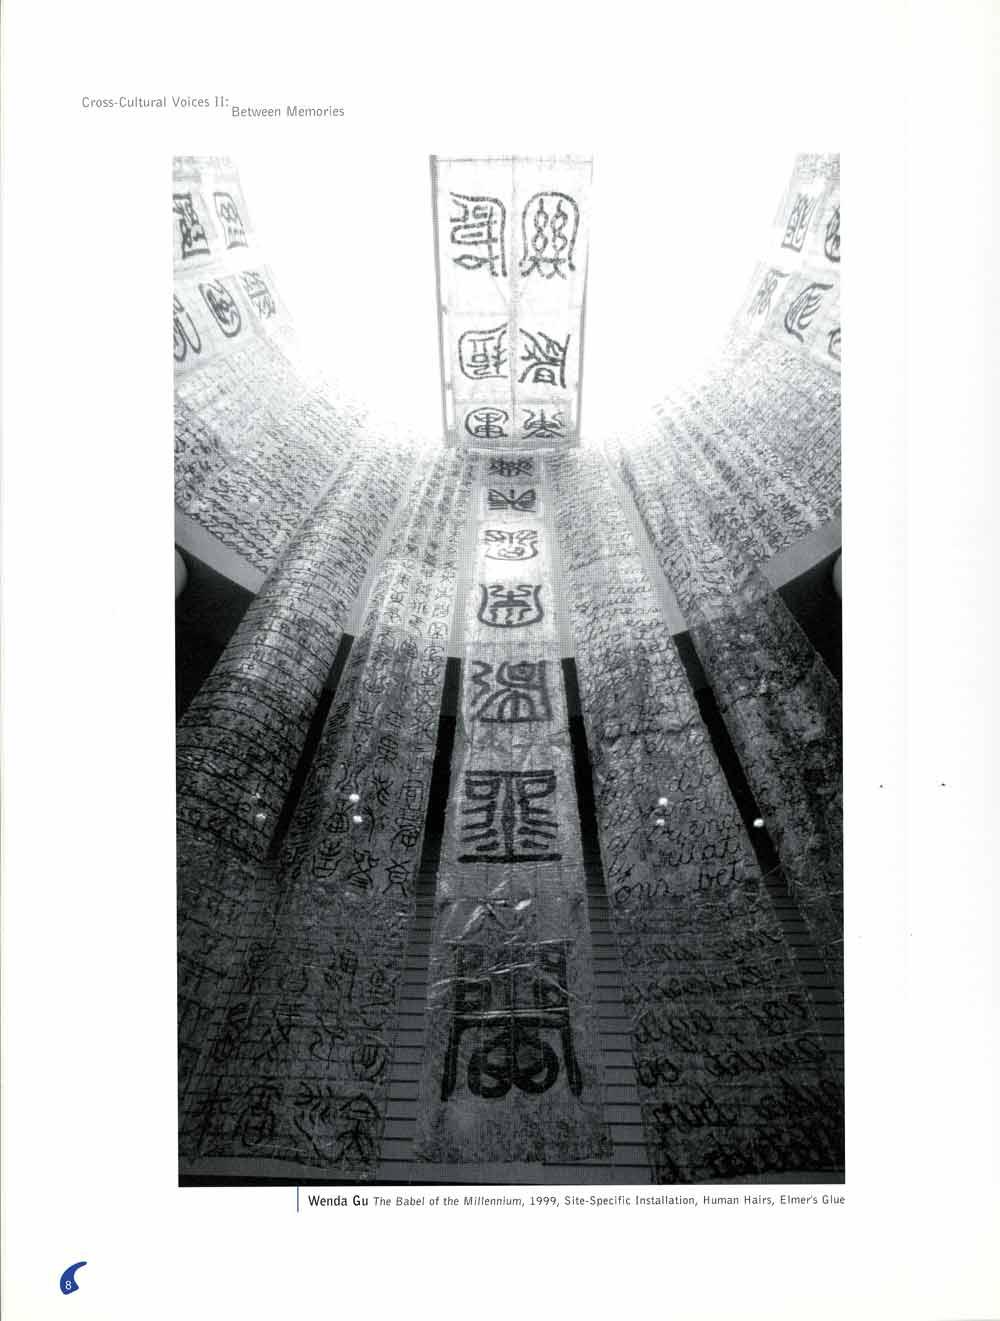 Cross-Cultural Voices II, exhibition catalog, pg 5